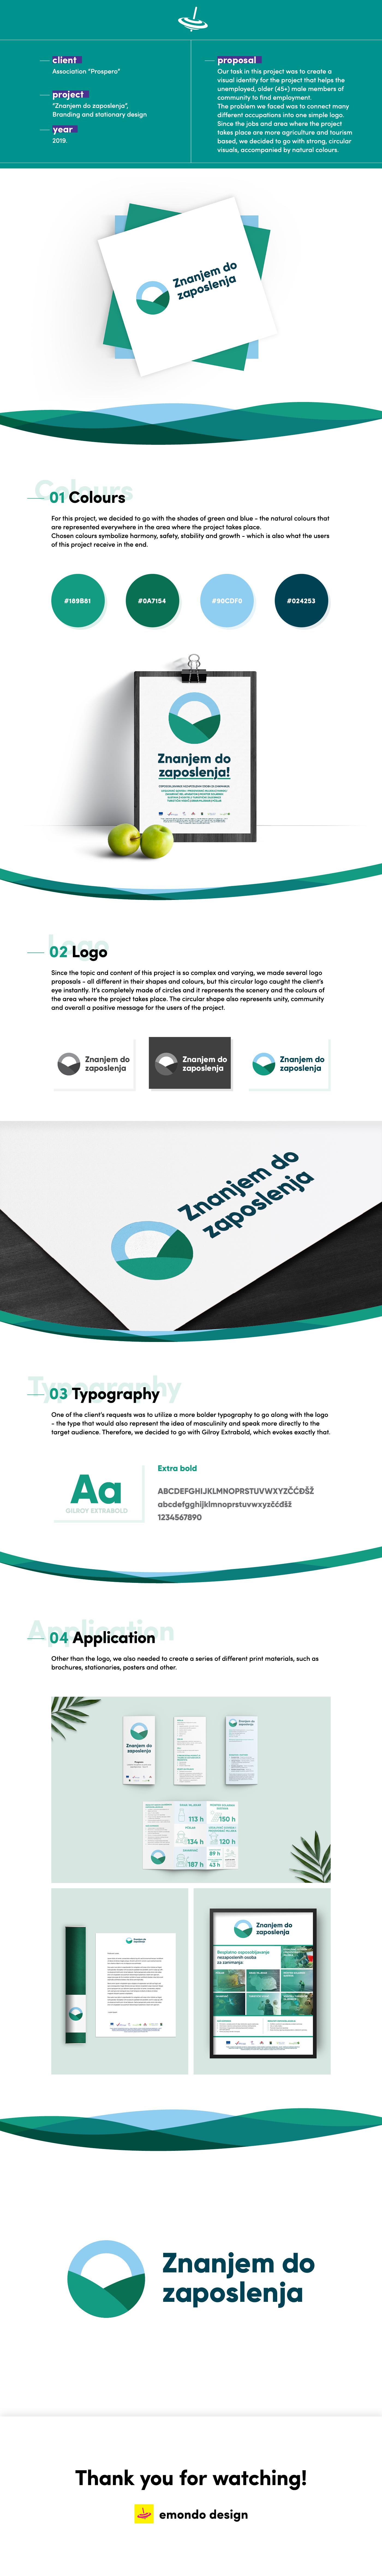 design branding  visual identity emondo design stationary logo EU project graphic design  posters brochure